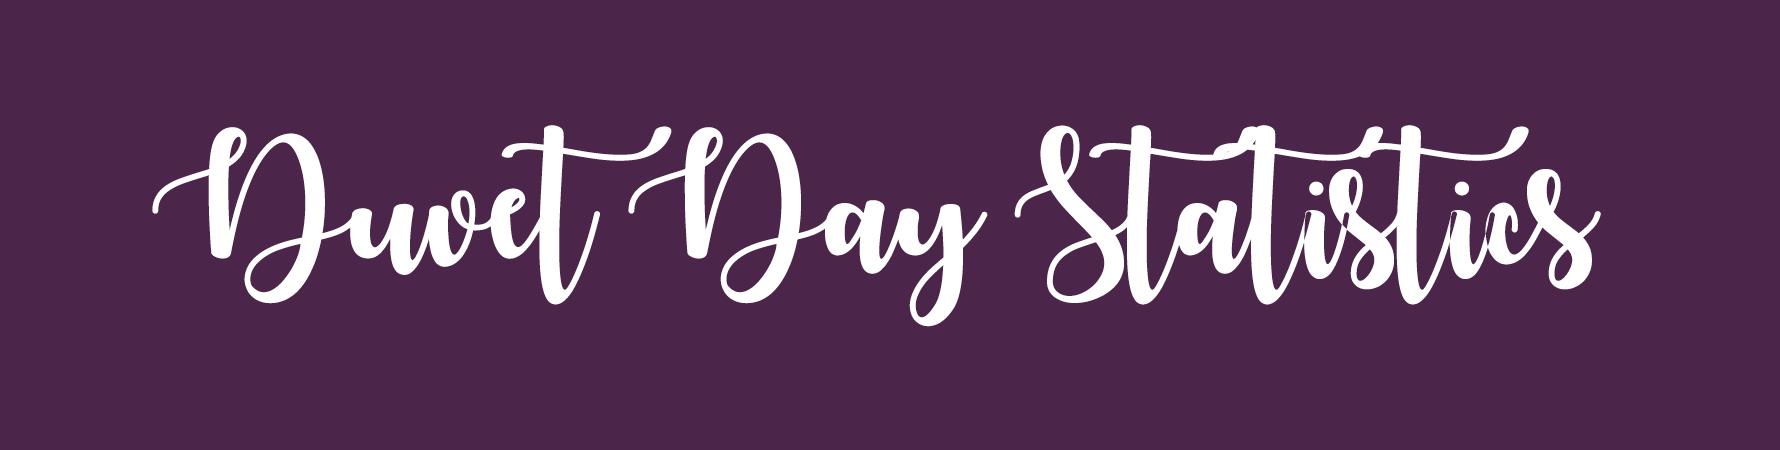 Duvet-Day-Statistics